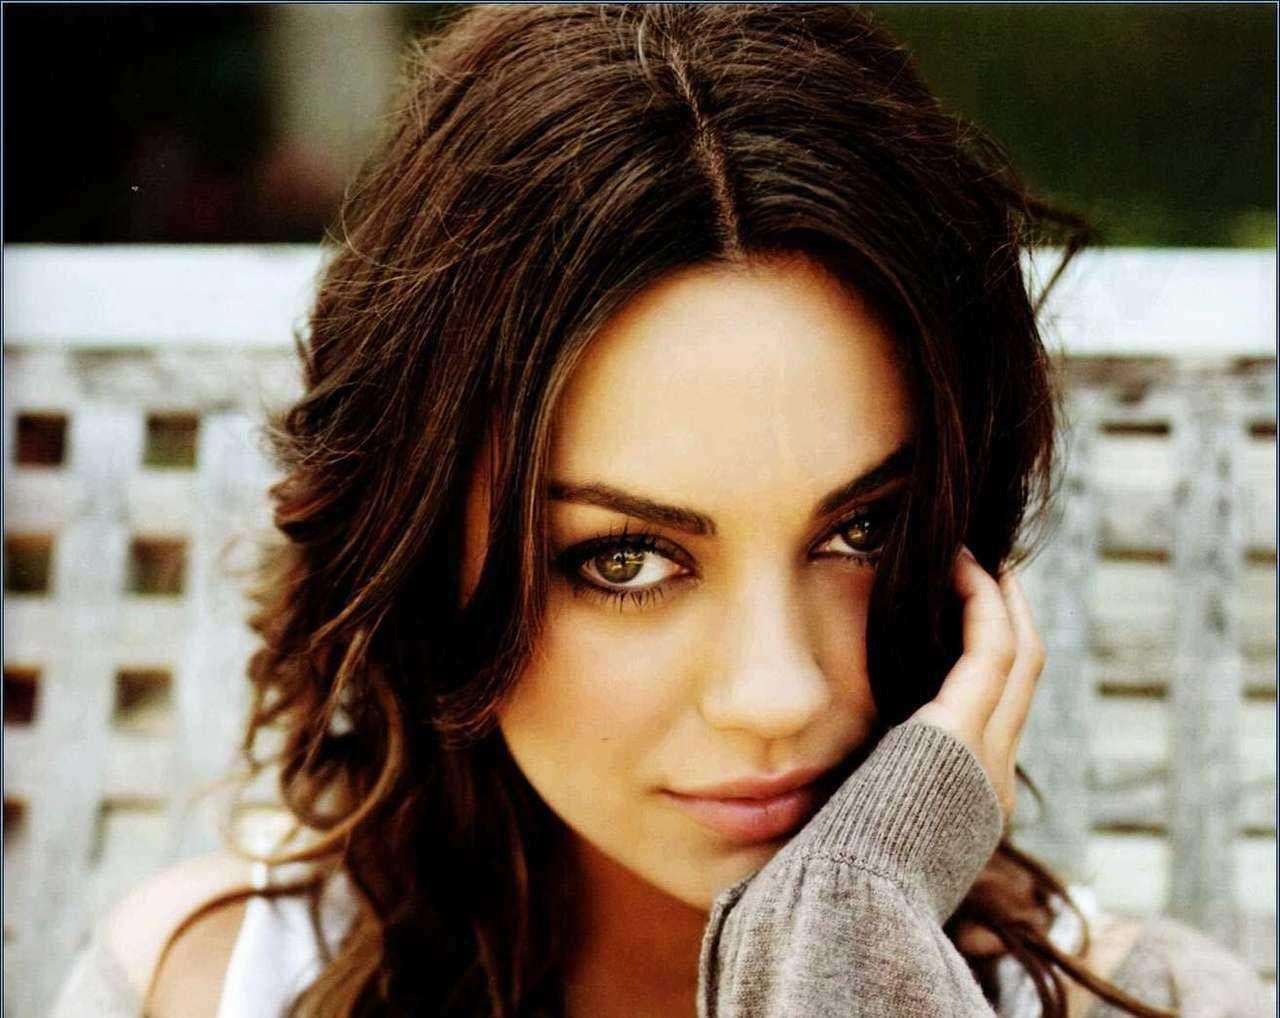 Mila Kunis wallpapers | Mila Kunis wallpapers - Part 8